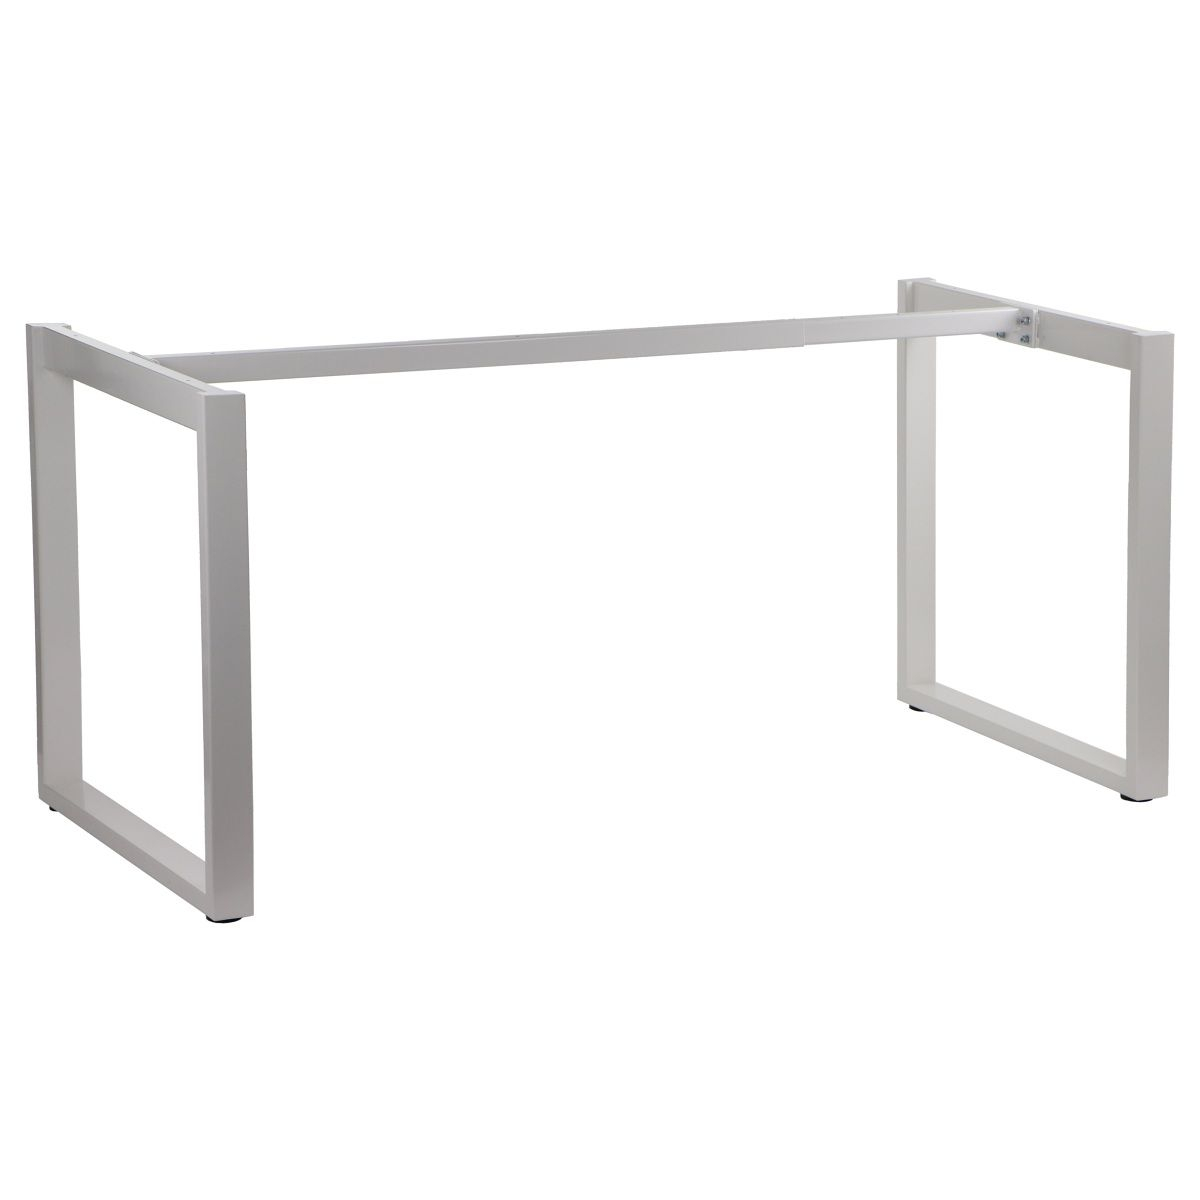 Stelaż skręcany do stołu i biurka EF-NY-131A/80 biały